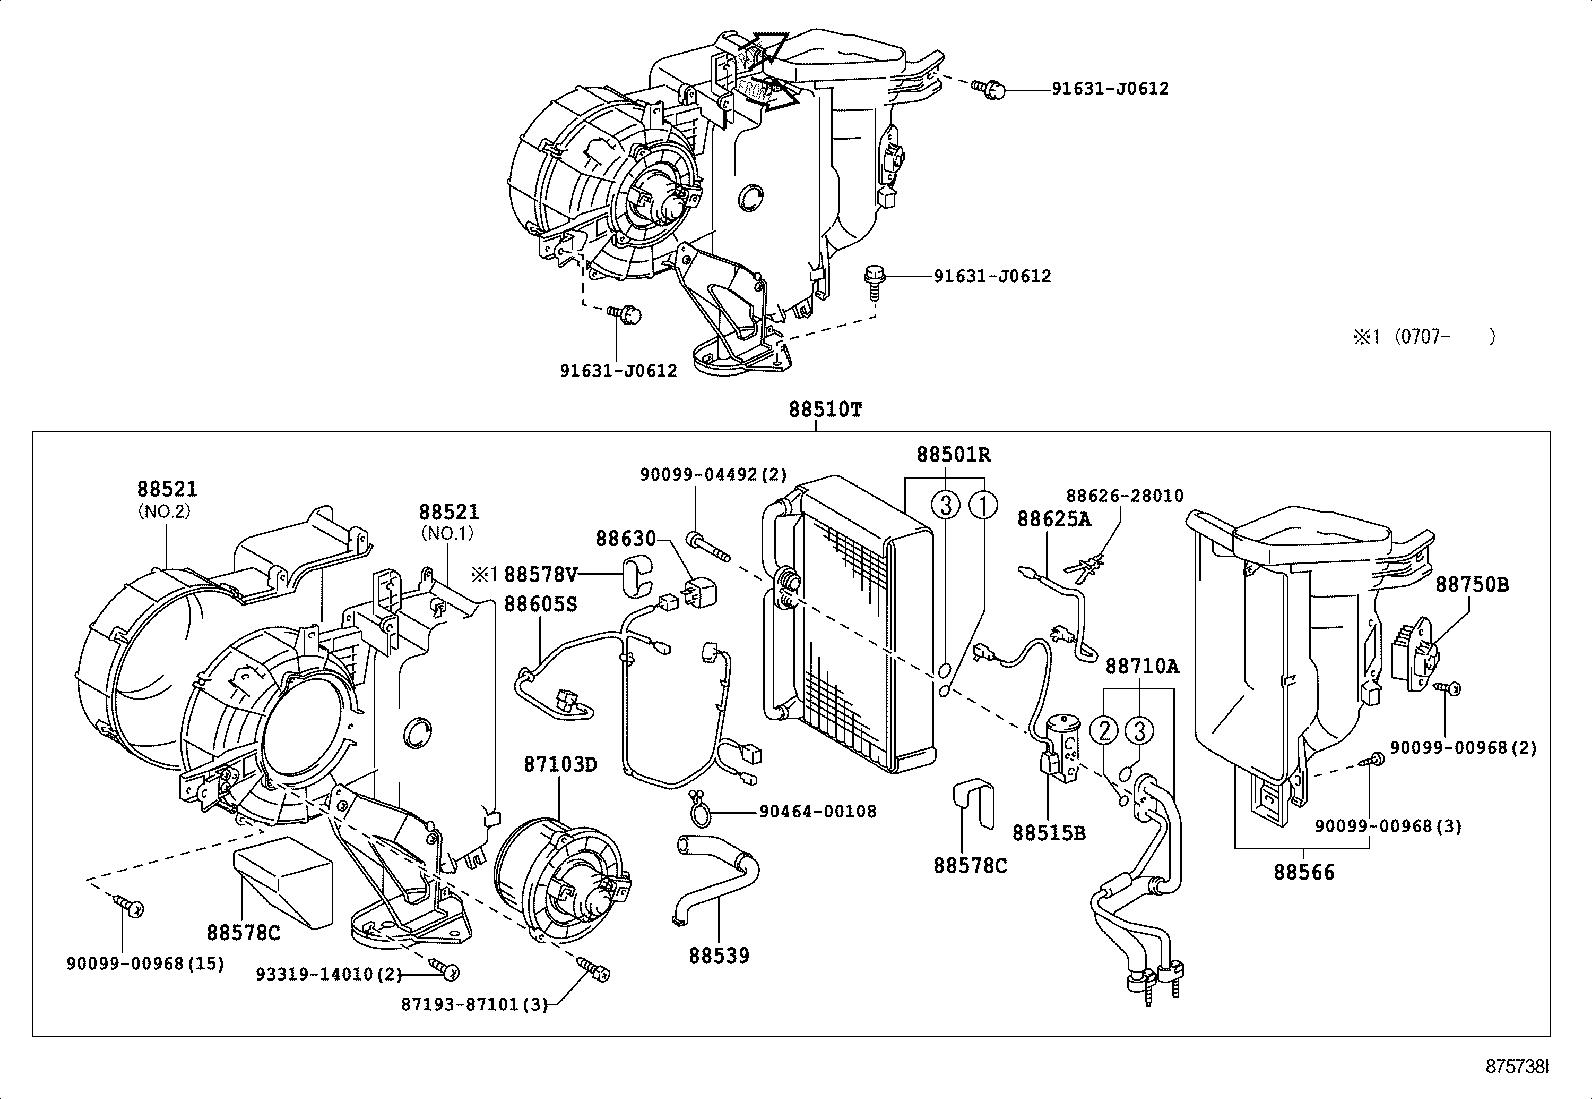 1976 toyota land cruiser wiring diagram motor control center 1972 fj40 harness fuse box elsavadorla